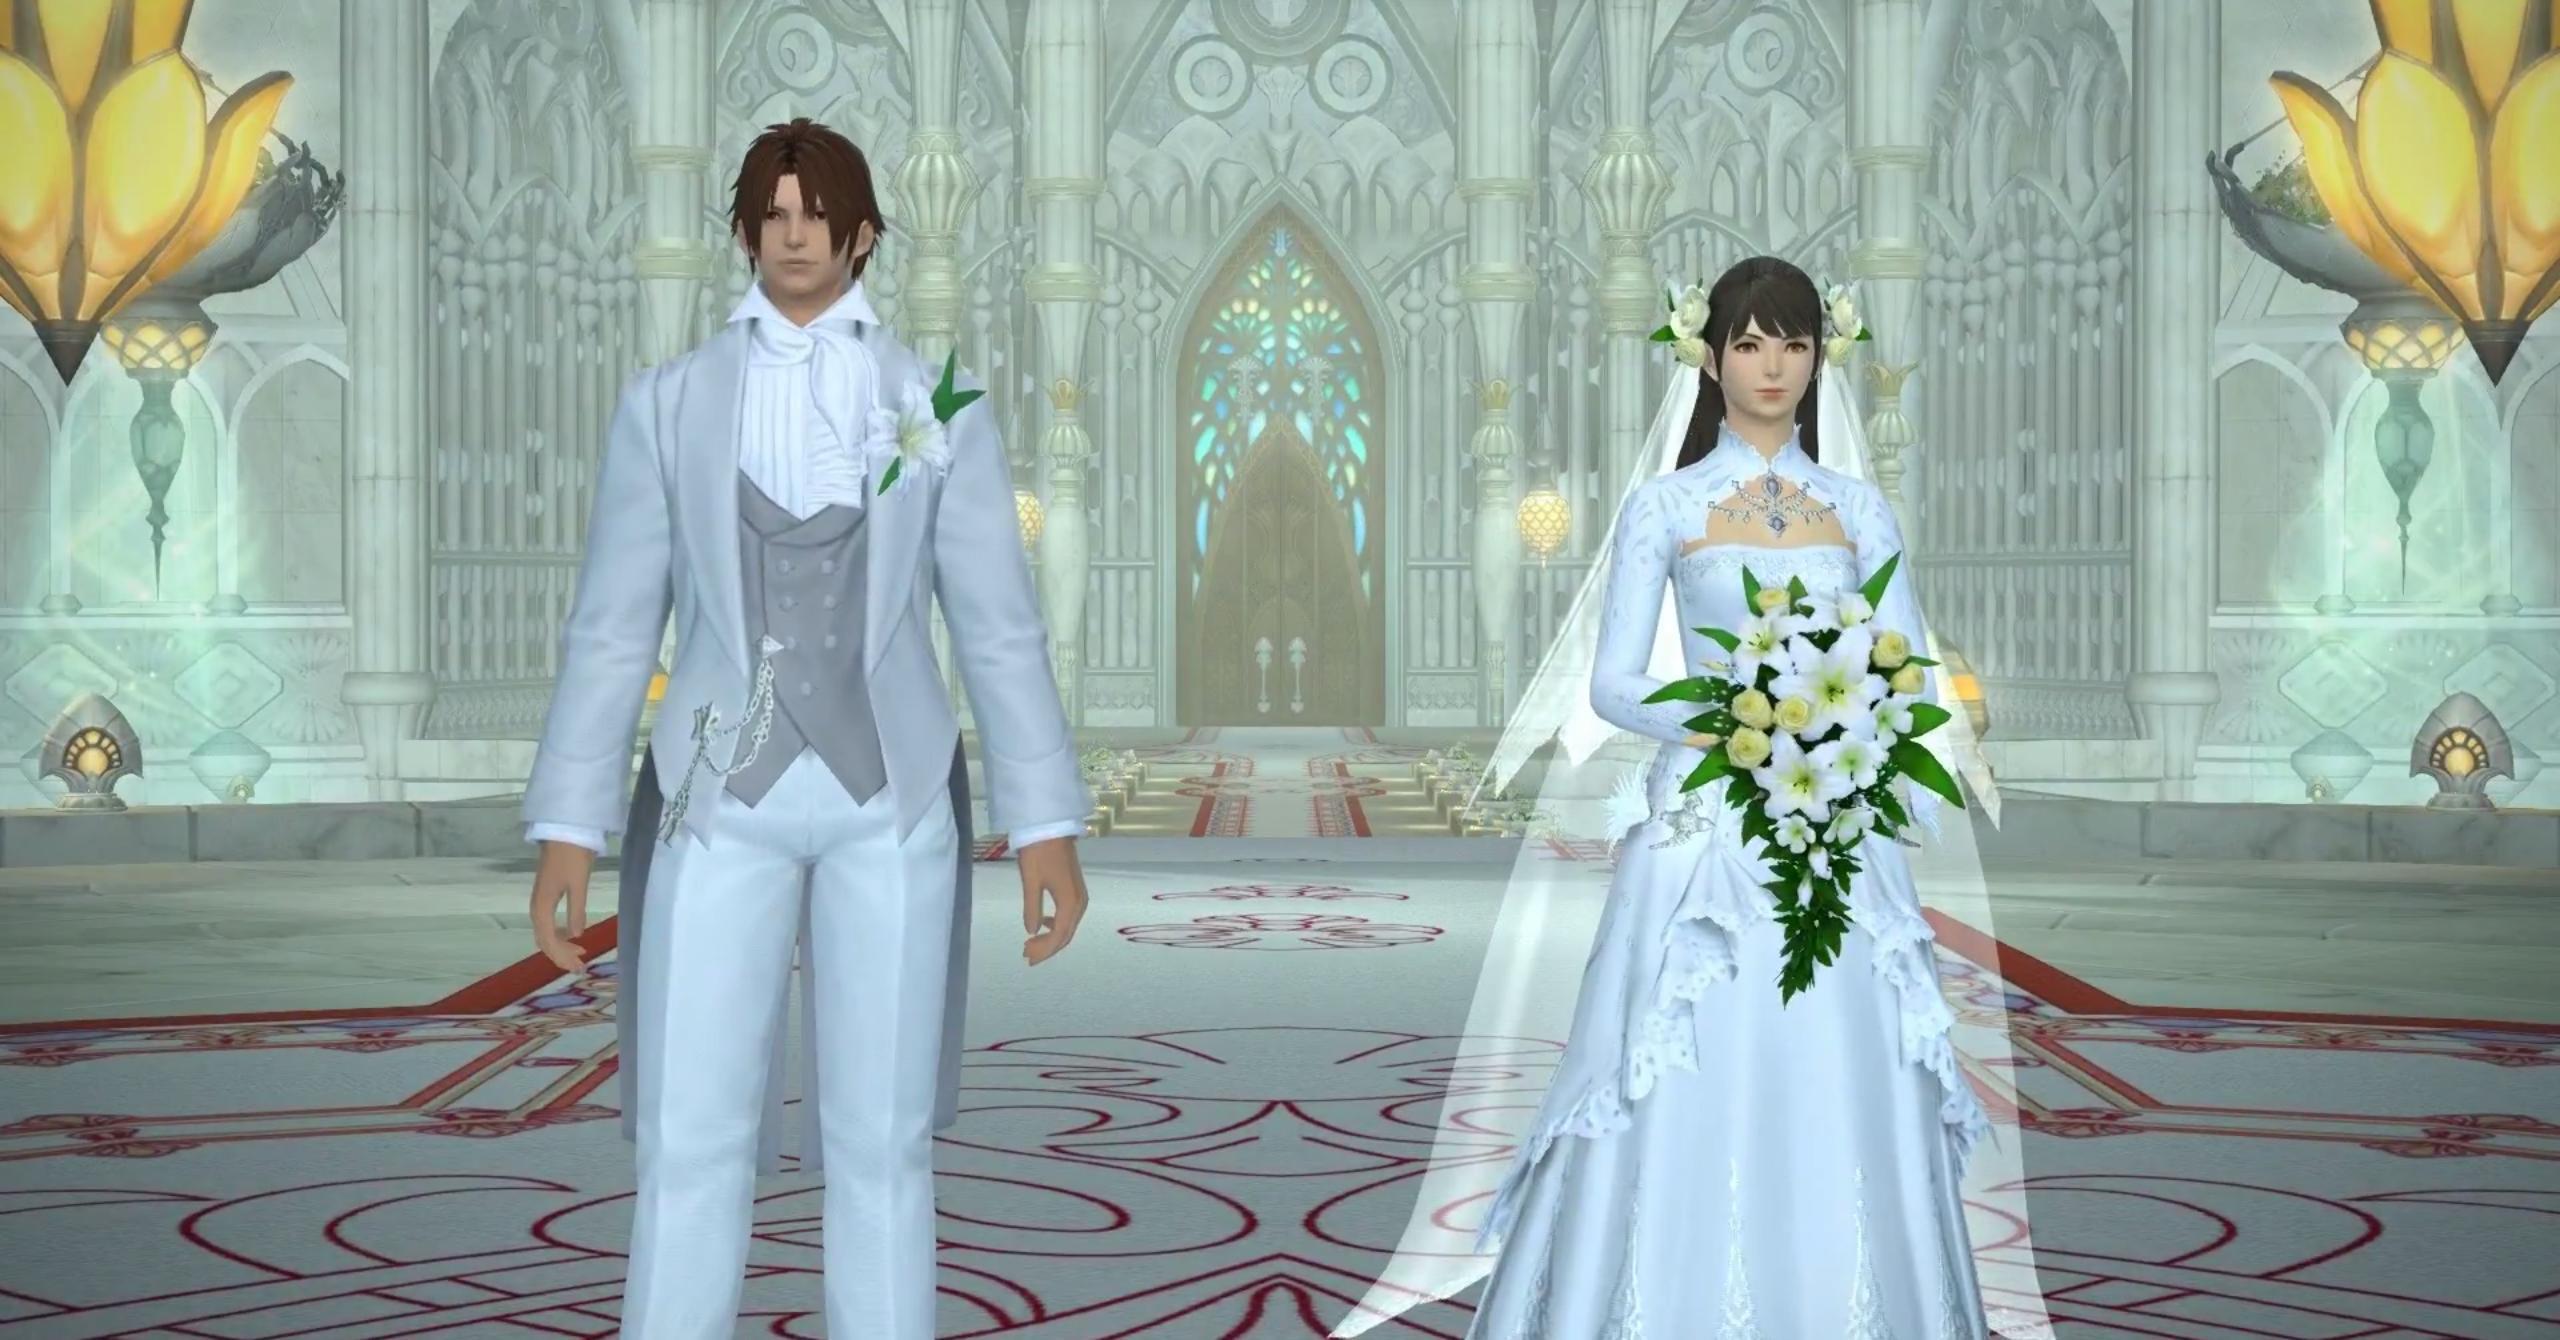 Final Fantasy Wedding Dress - The Best Wedding Dress 2017